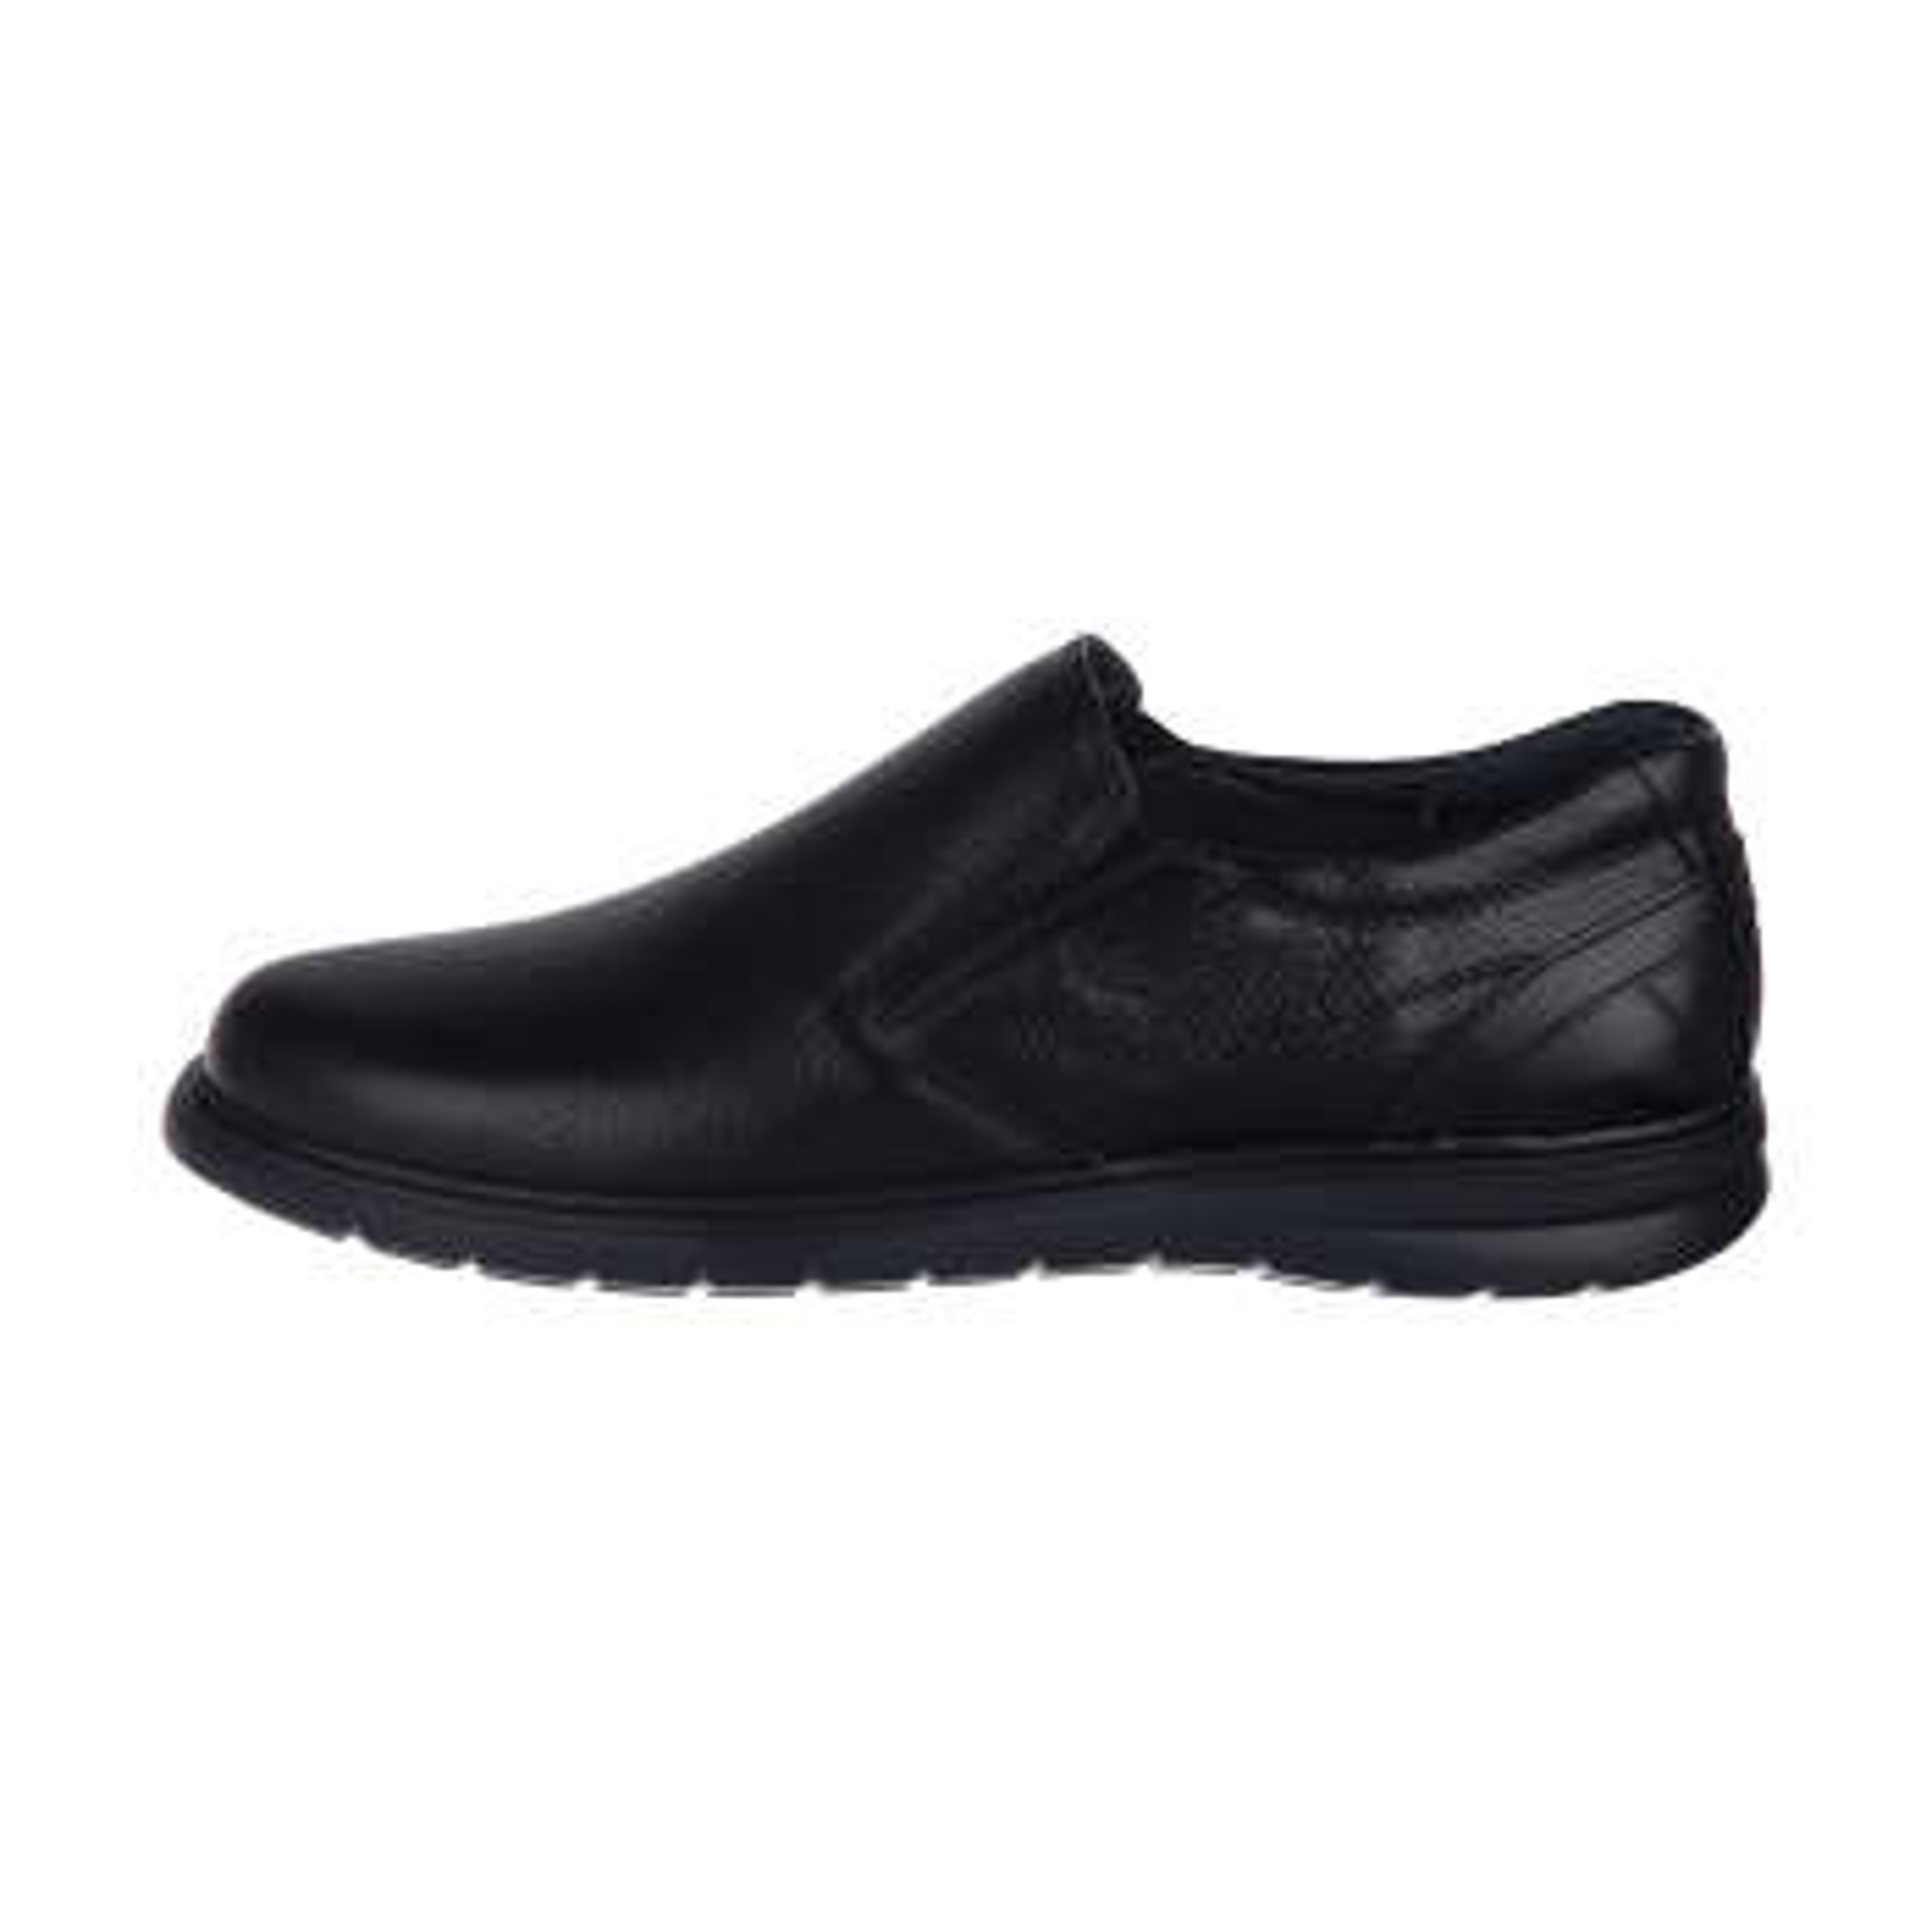 کفش روزمره مردانه دلفارد مدل 8334A503101